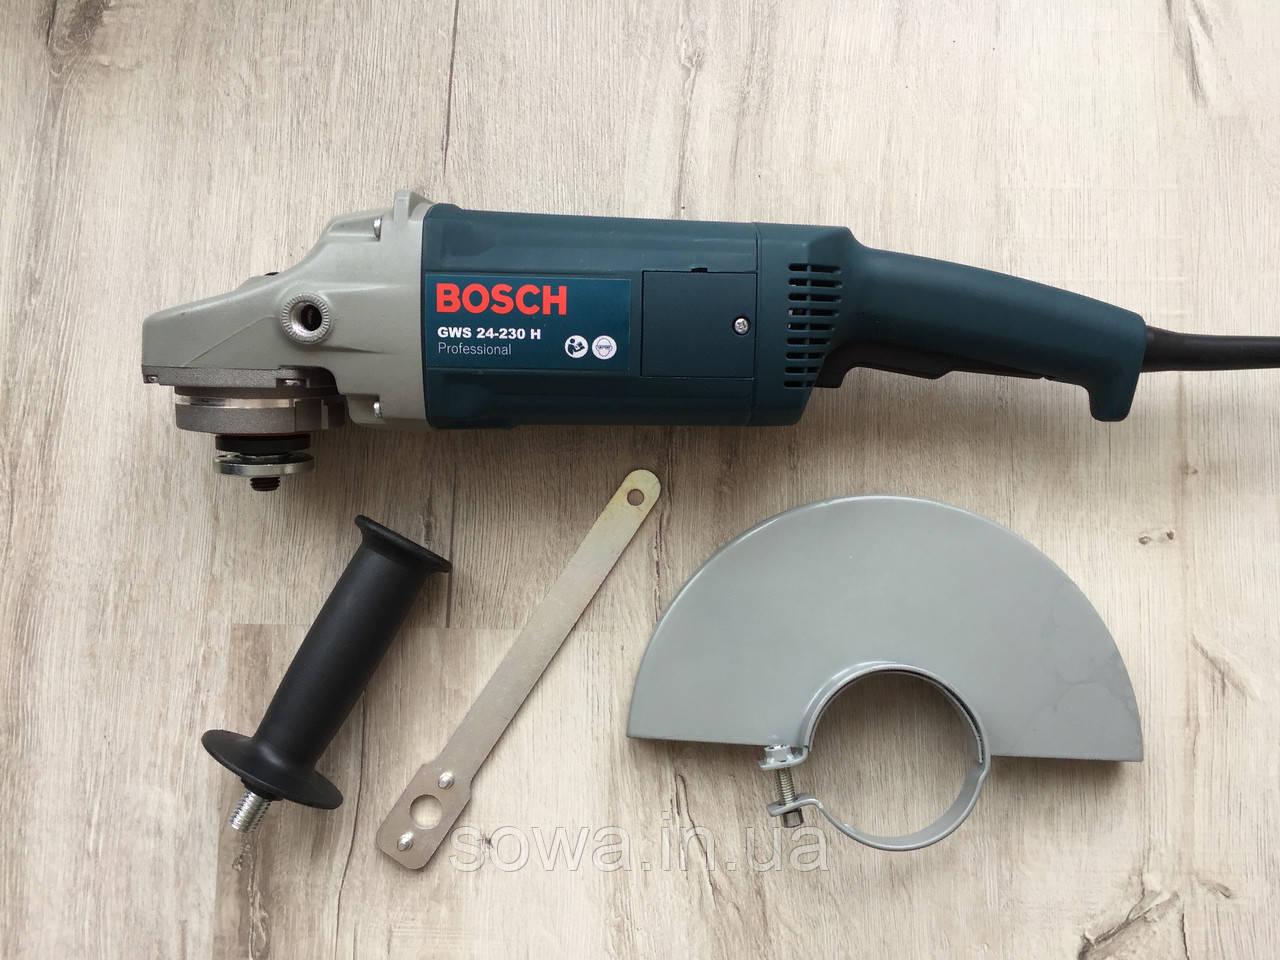 ✔️ Болгарка Bosch_бош GWS 24-230H  ( 230 круг, 2400Вт )   + ПОДАРОК